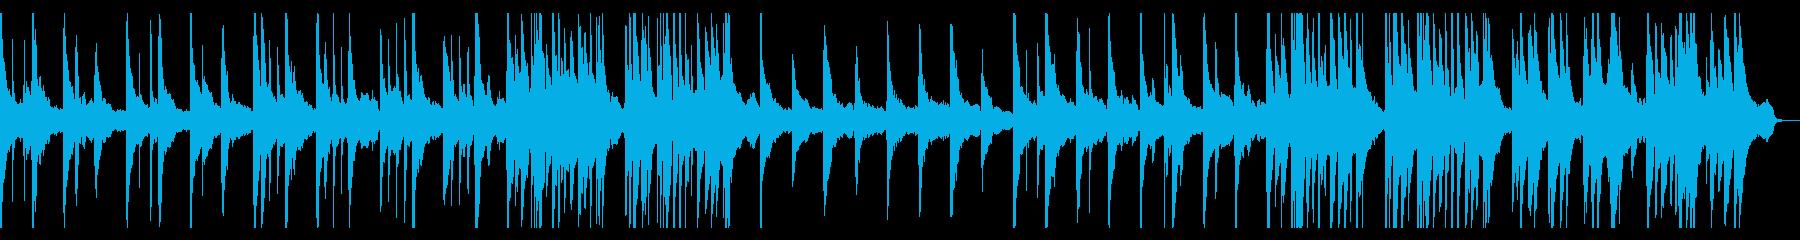 memory. R & B_4's reproduced waveform